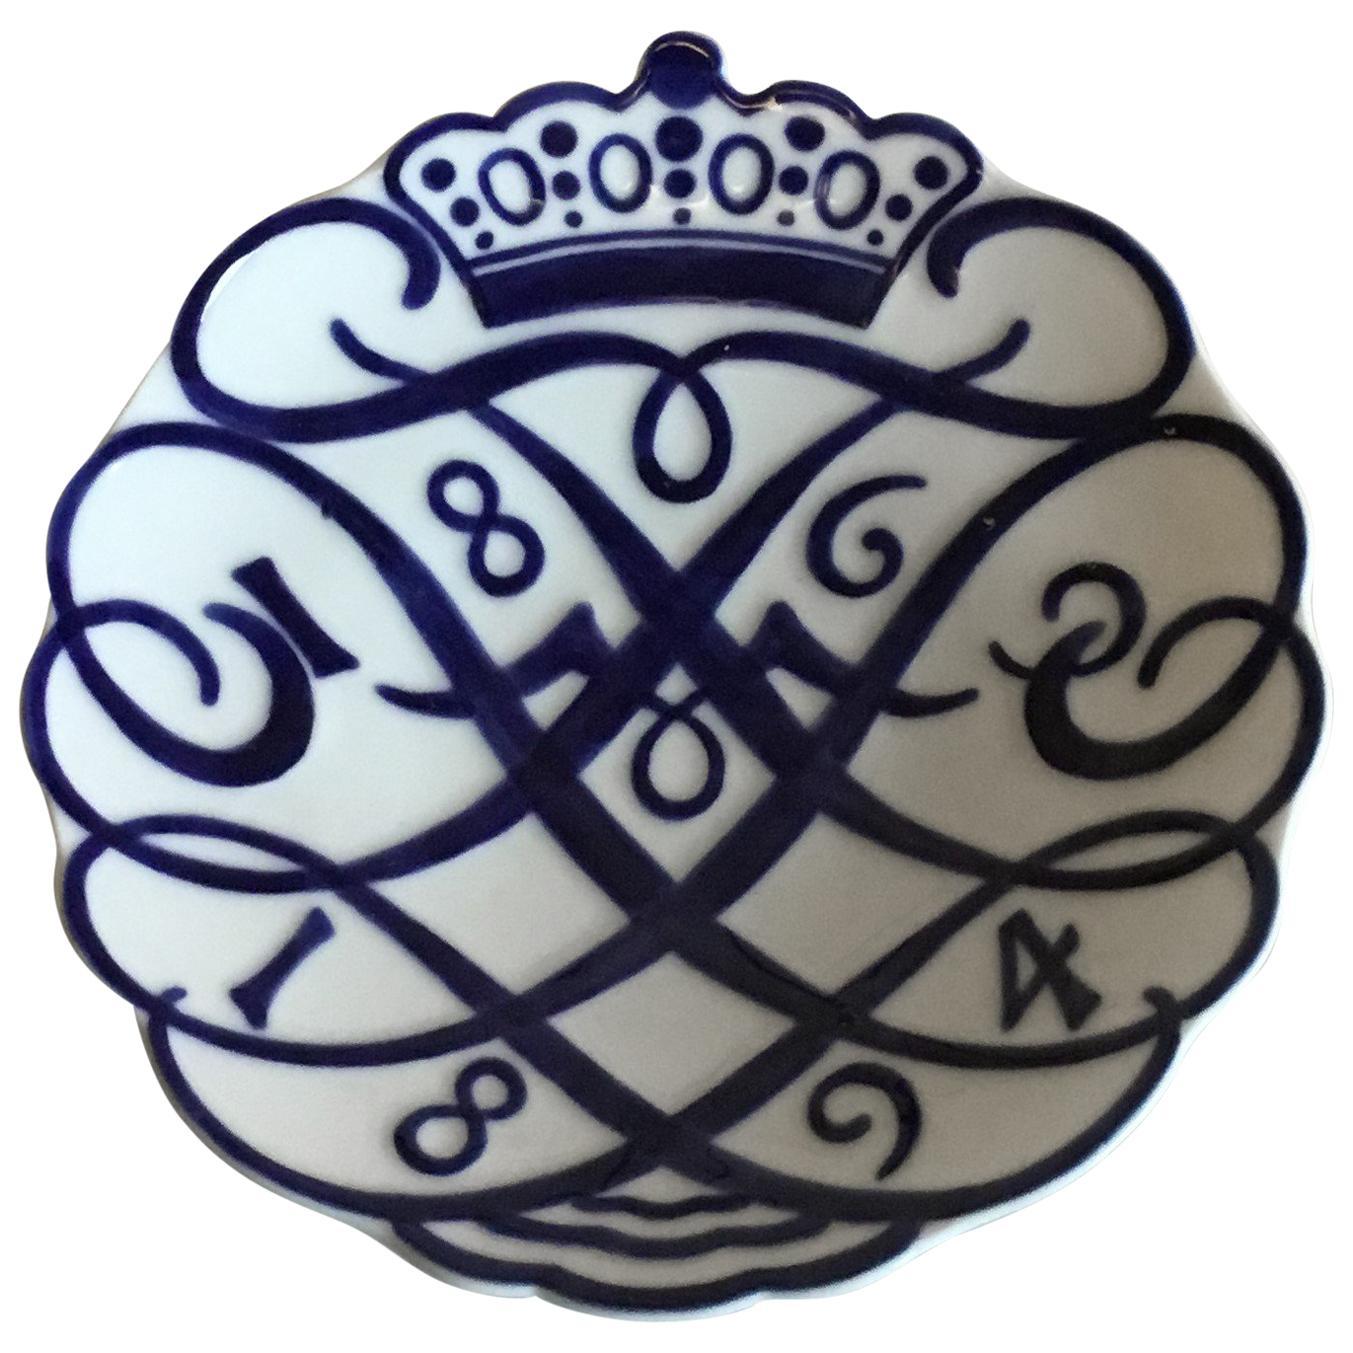 Royal Copenhagen Commemorative Plate from 1894 RC-CM3